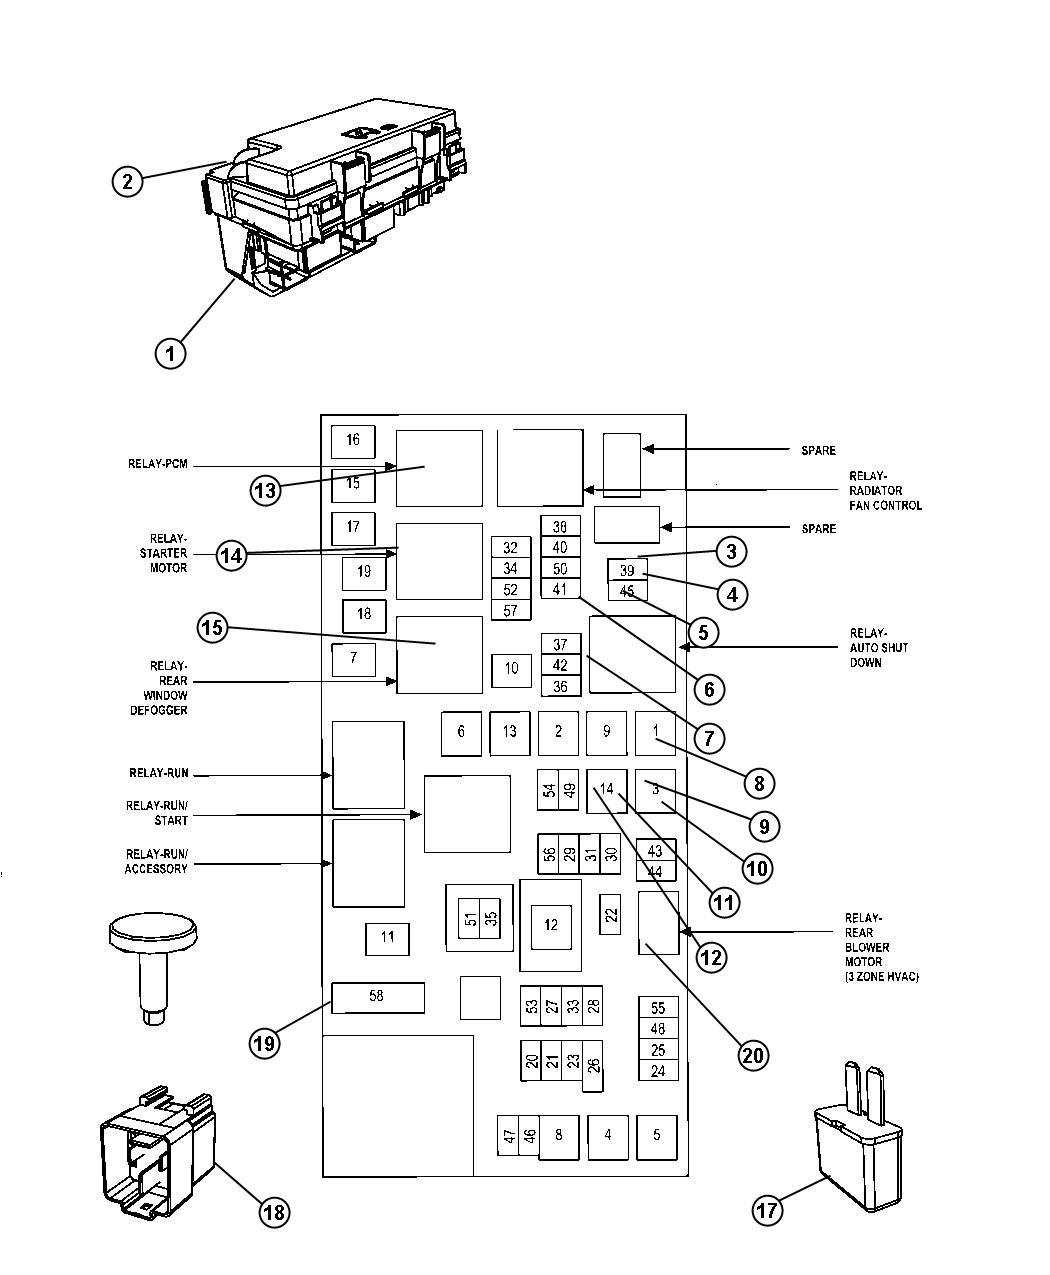 [EQHS_1162]  SO_0929] 2011 Journey Fuse Box Schematic Wiring | Dodge Journey Fuse Box Diagram |  | Ilari Benkeme Mohammedshrine Librar Wiring 101